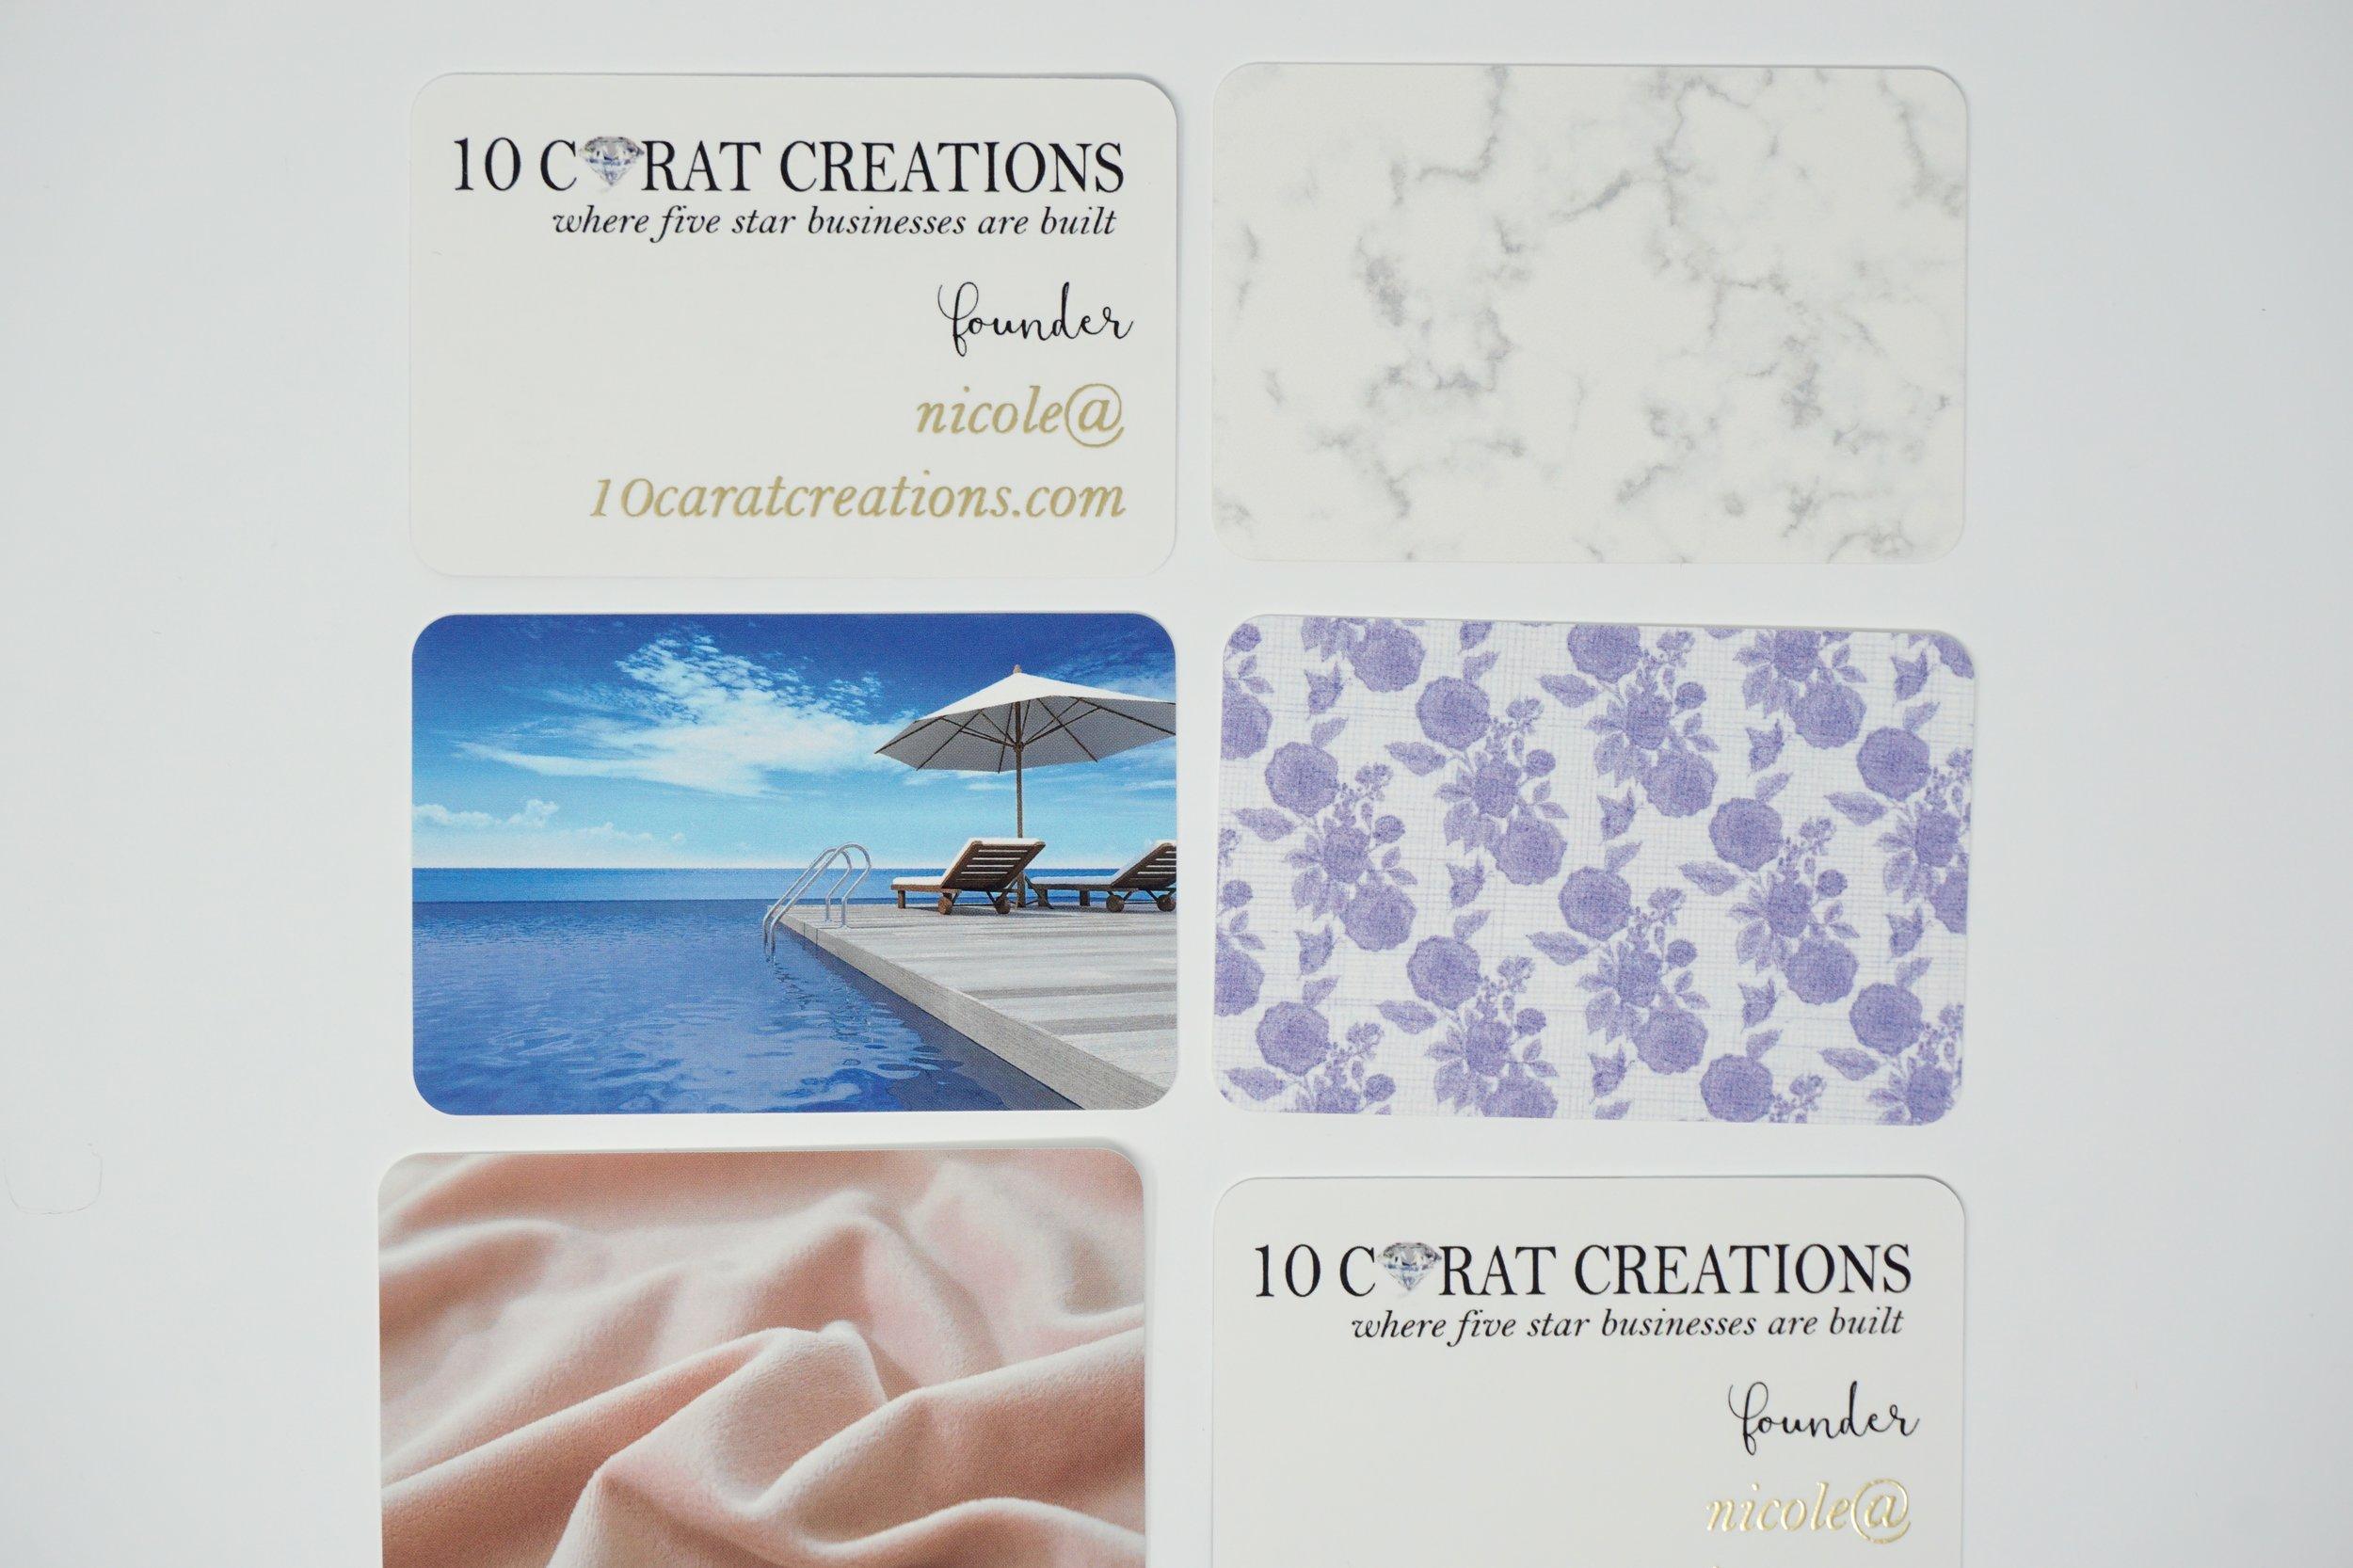 10-carat-creations-business-cards.jpg